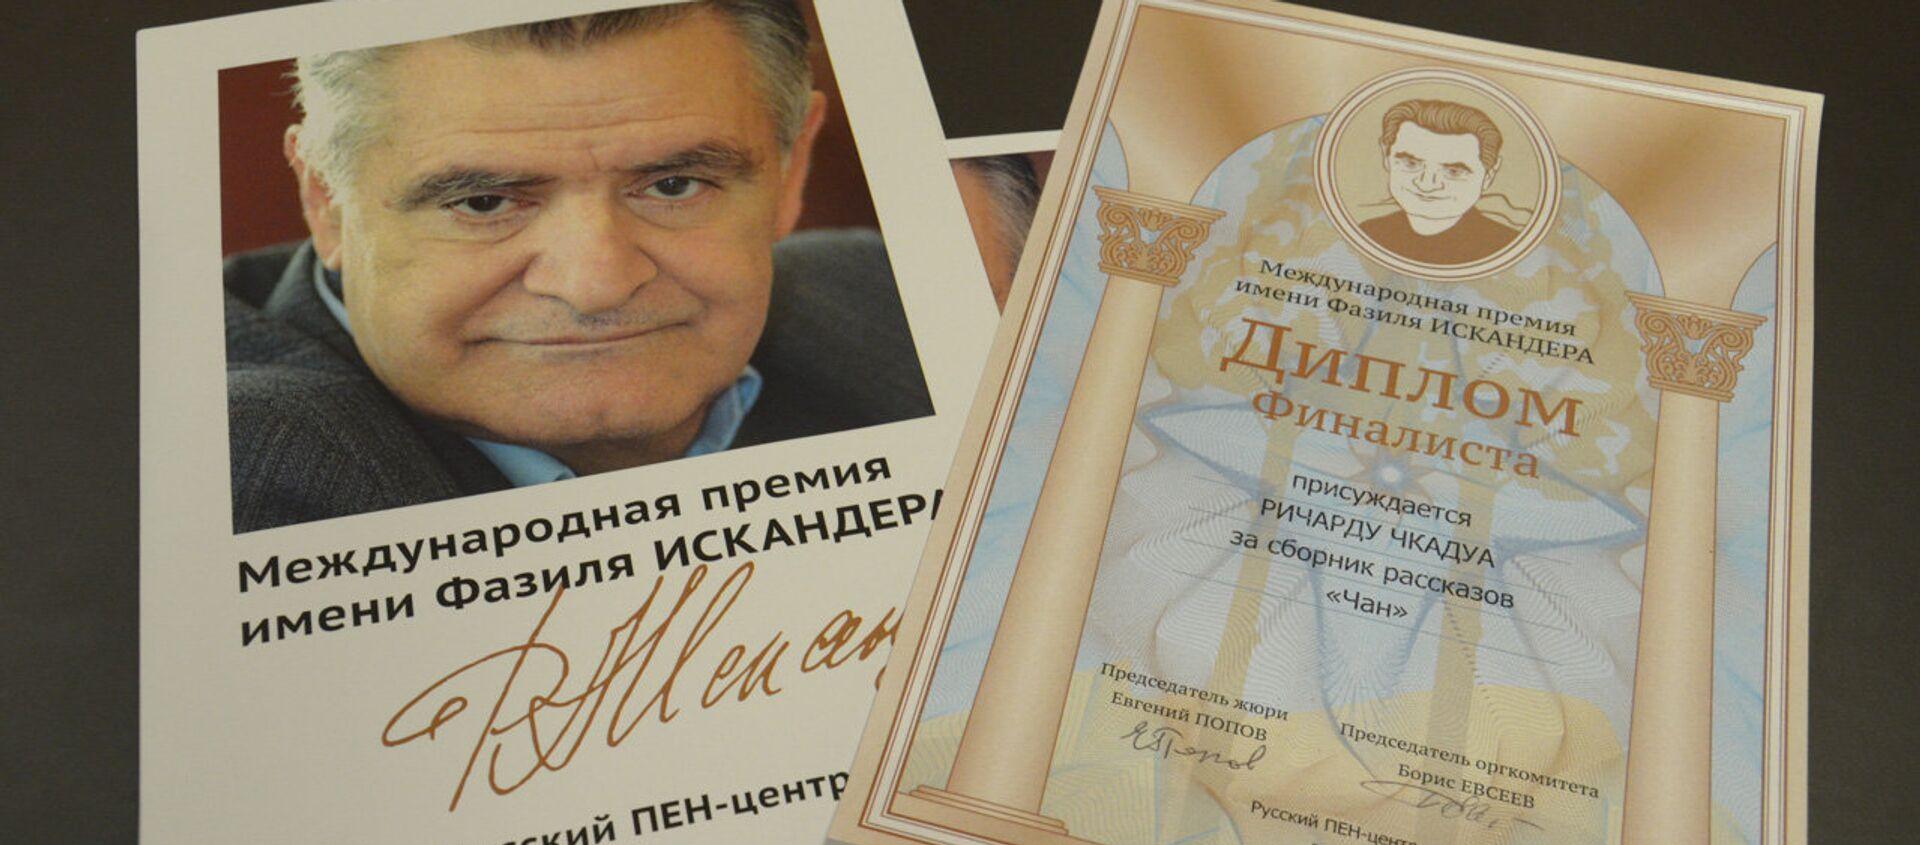 Пресс-конференция с лауреатами премии имени Фазиля Искандера - Sputnik Абхазия, 1920, 19.05.2021